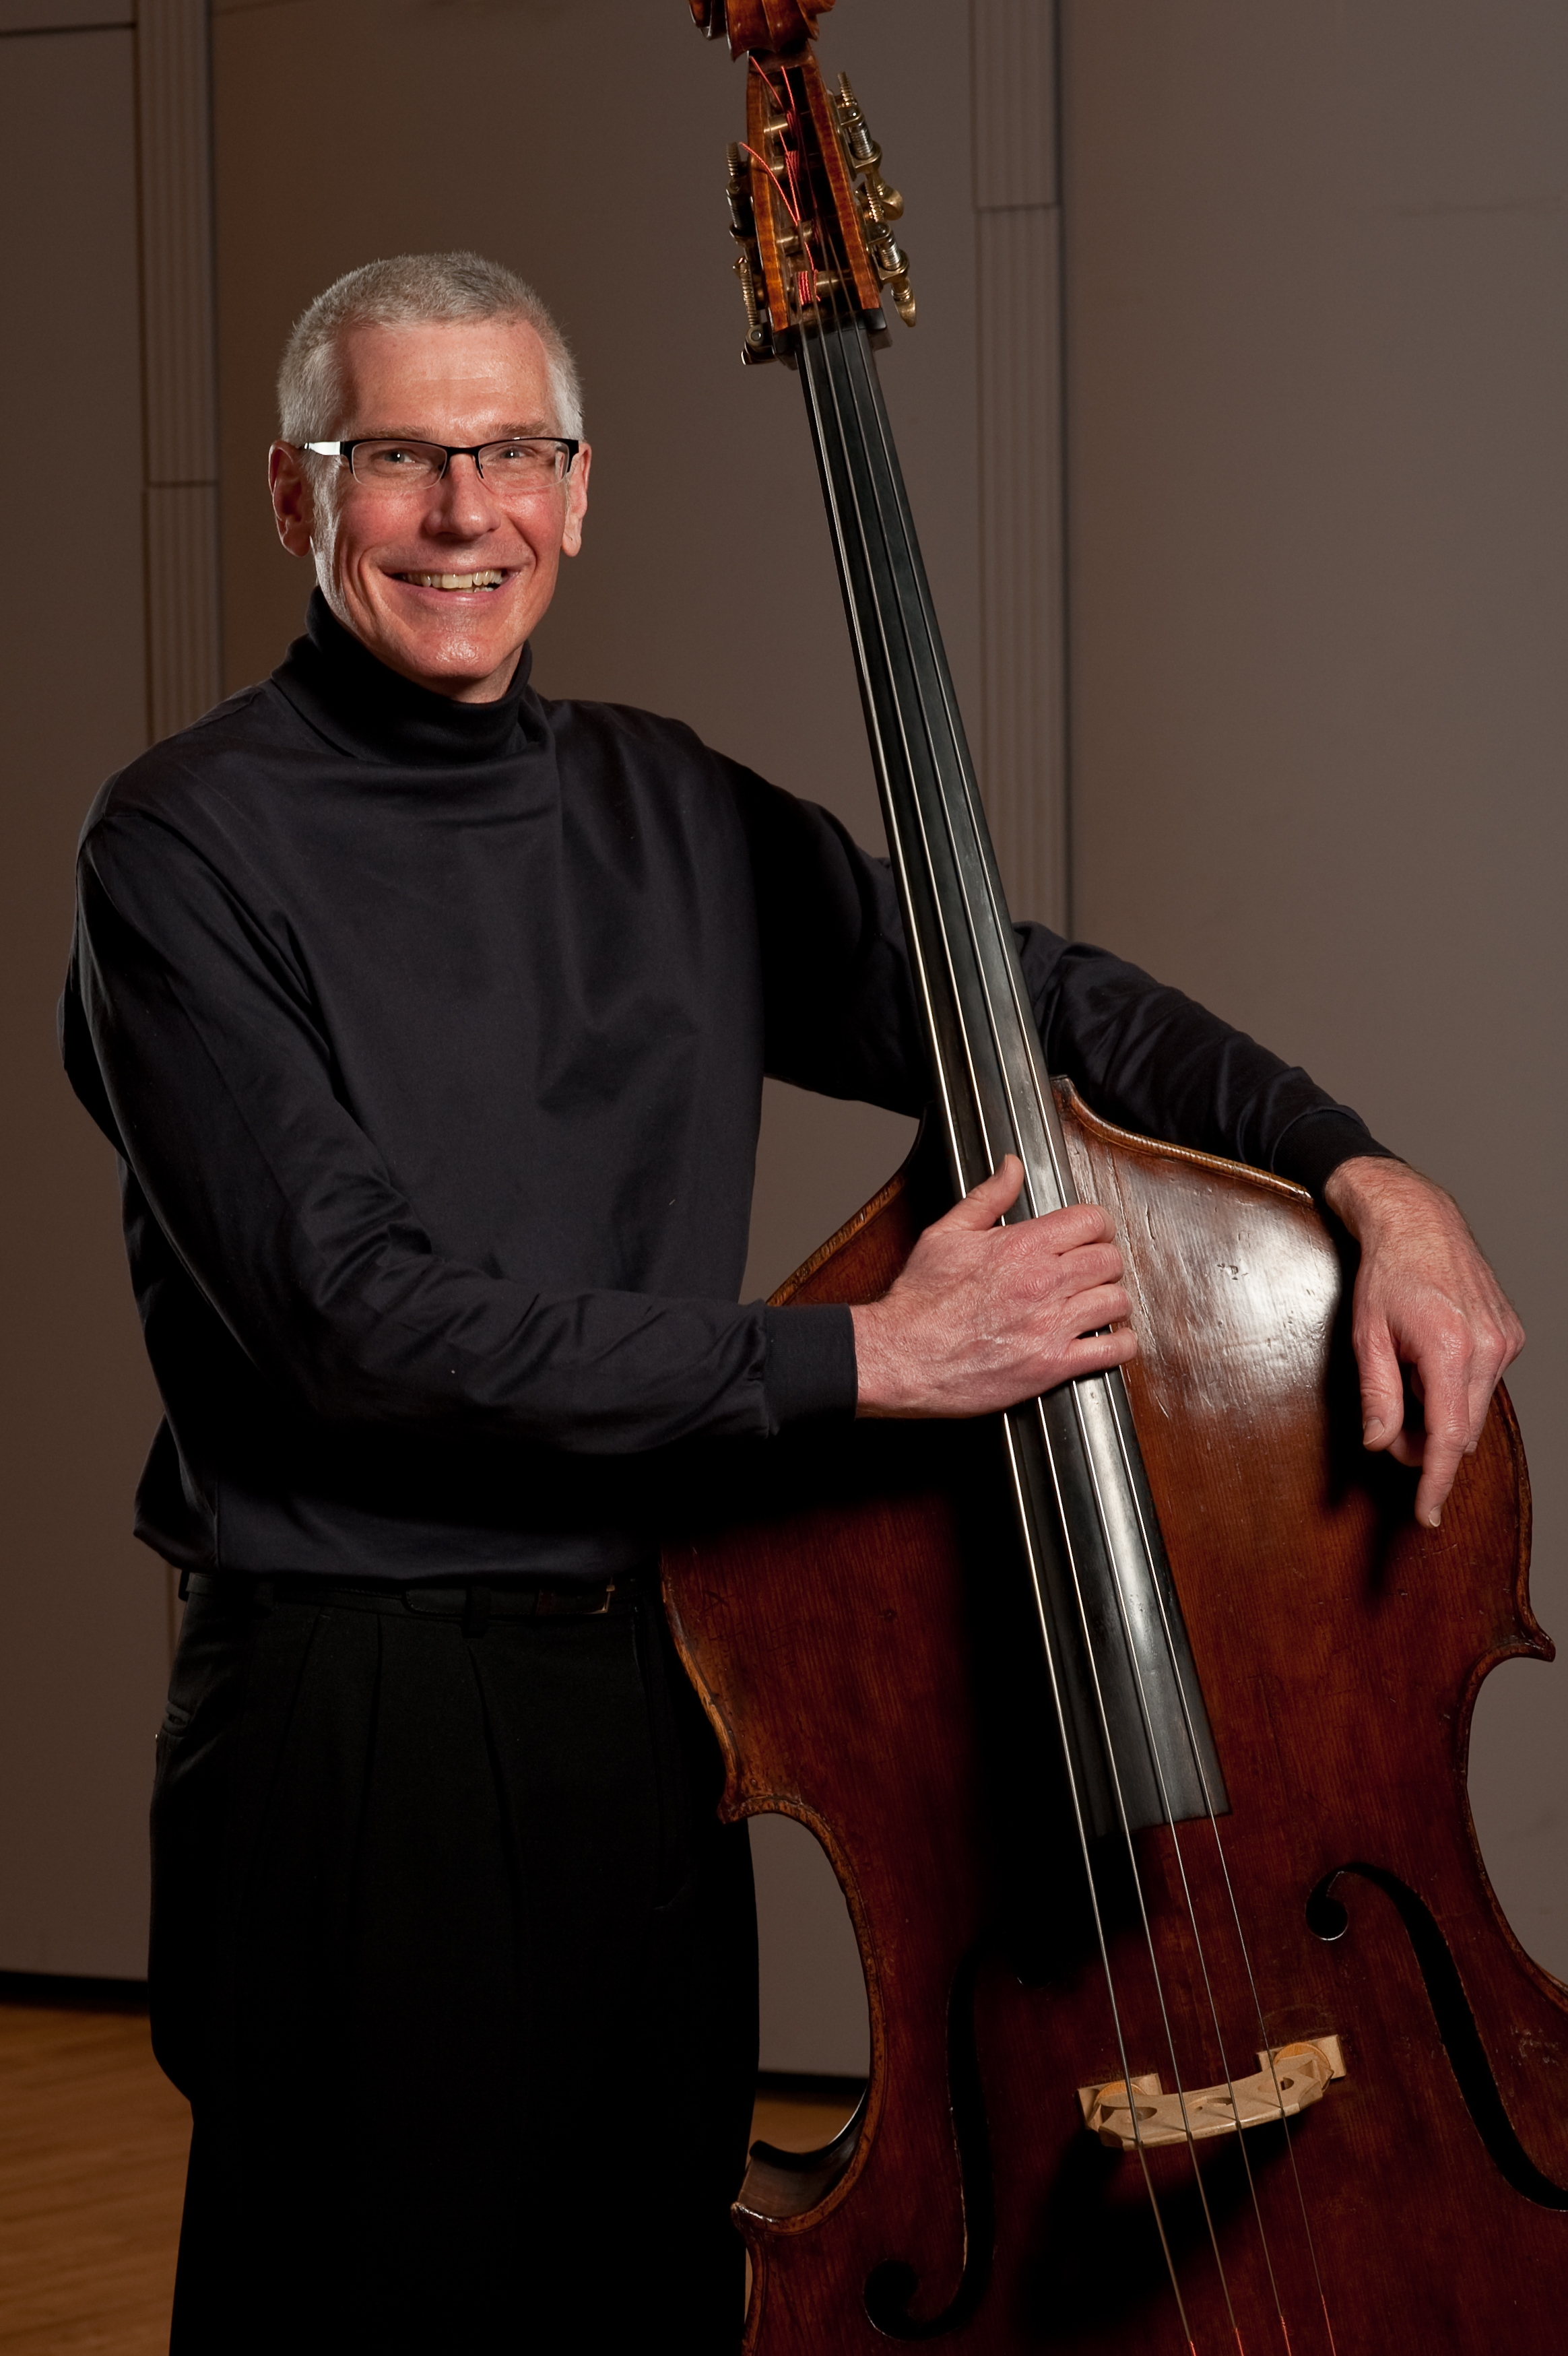 Kevin Piekarski